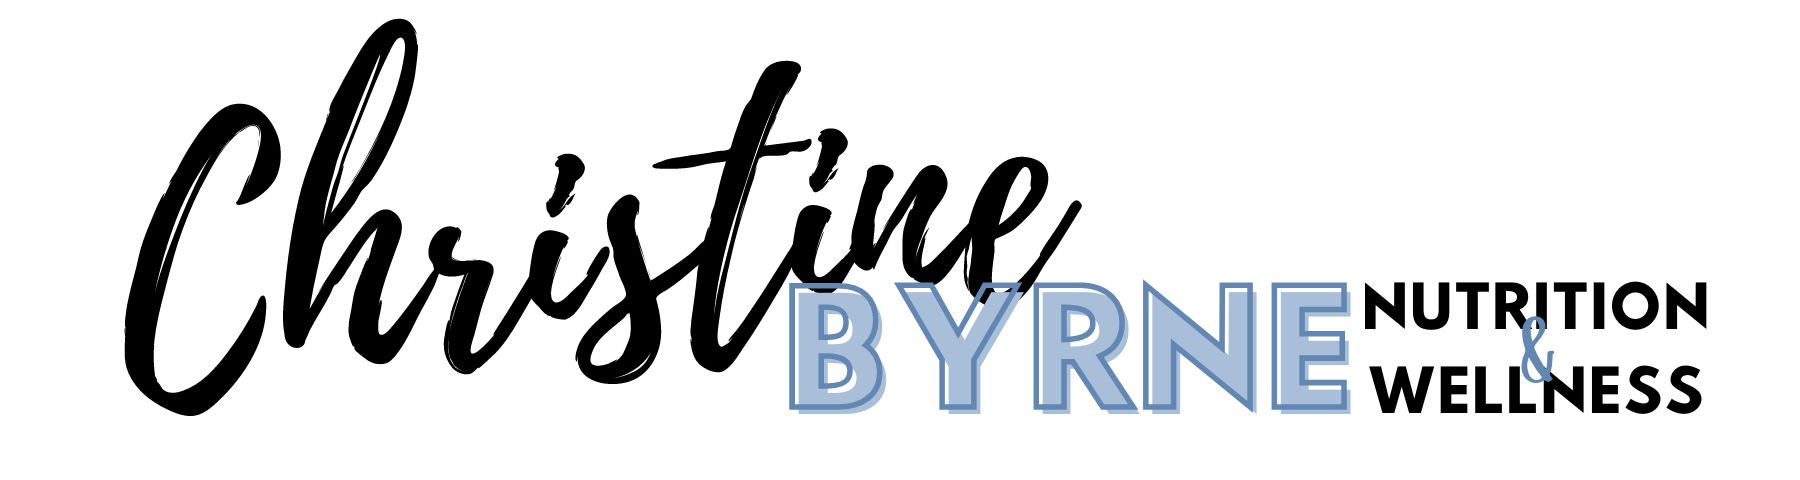 Christine Byrne Nutrition and Wellness Banner